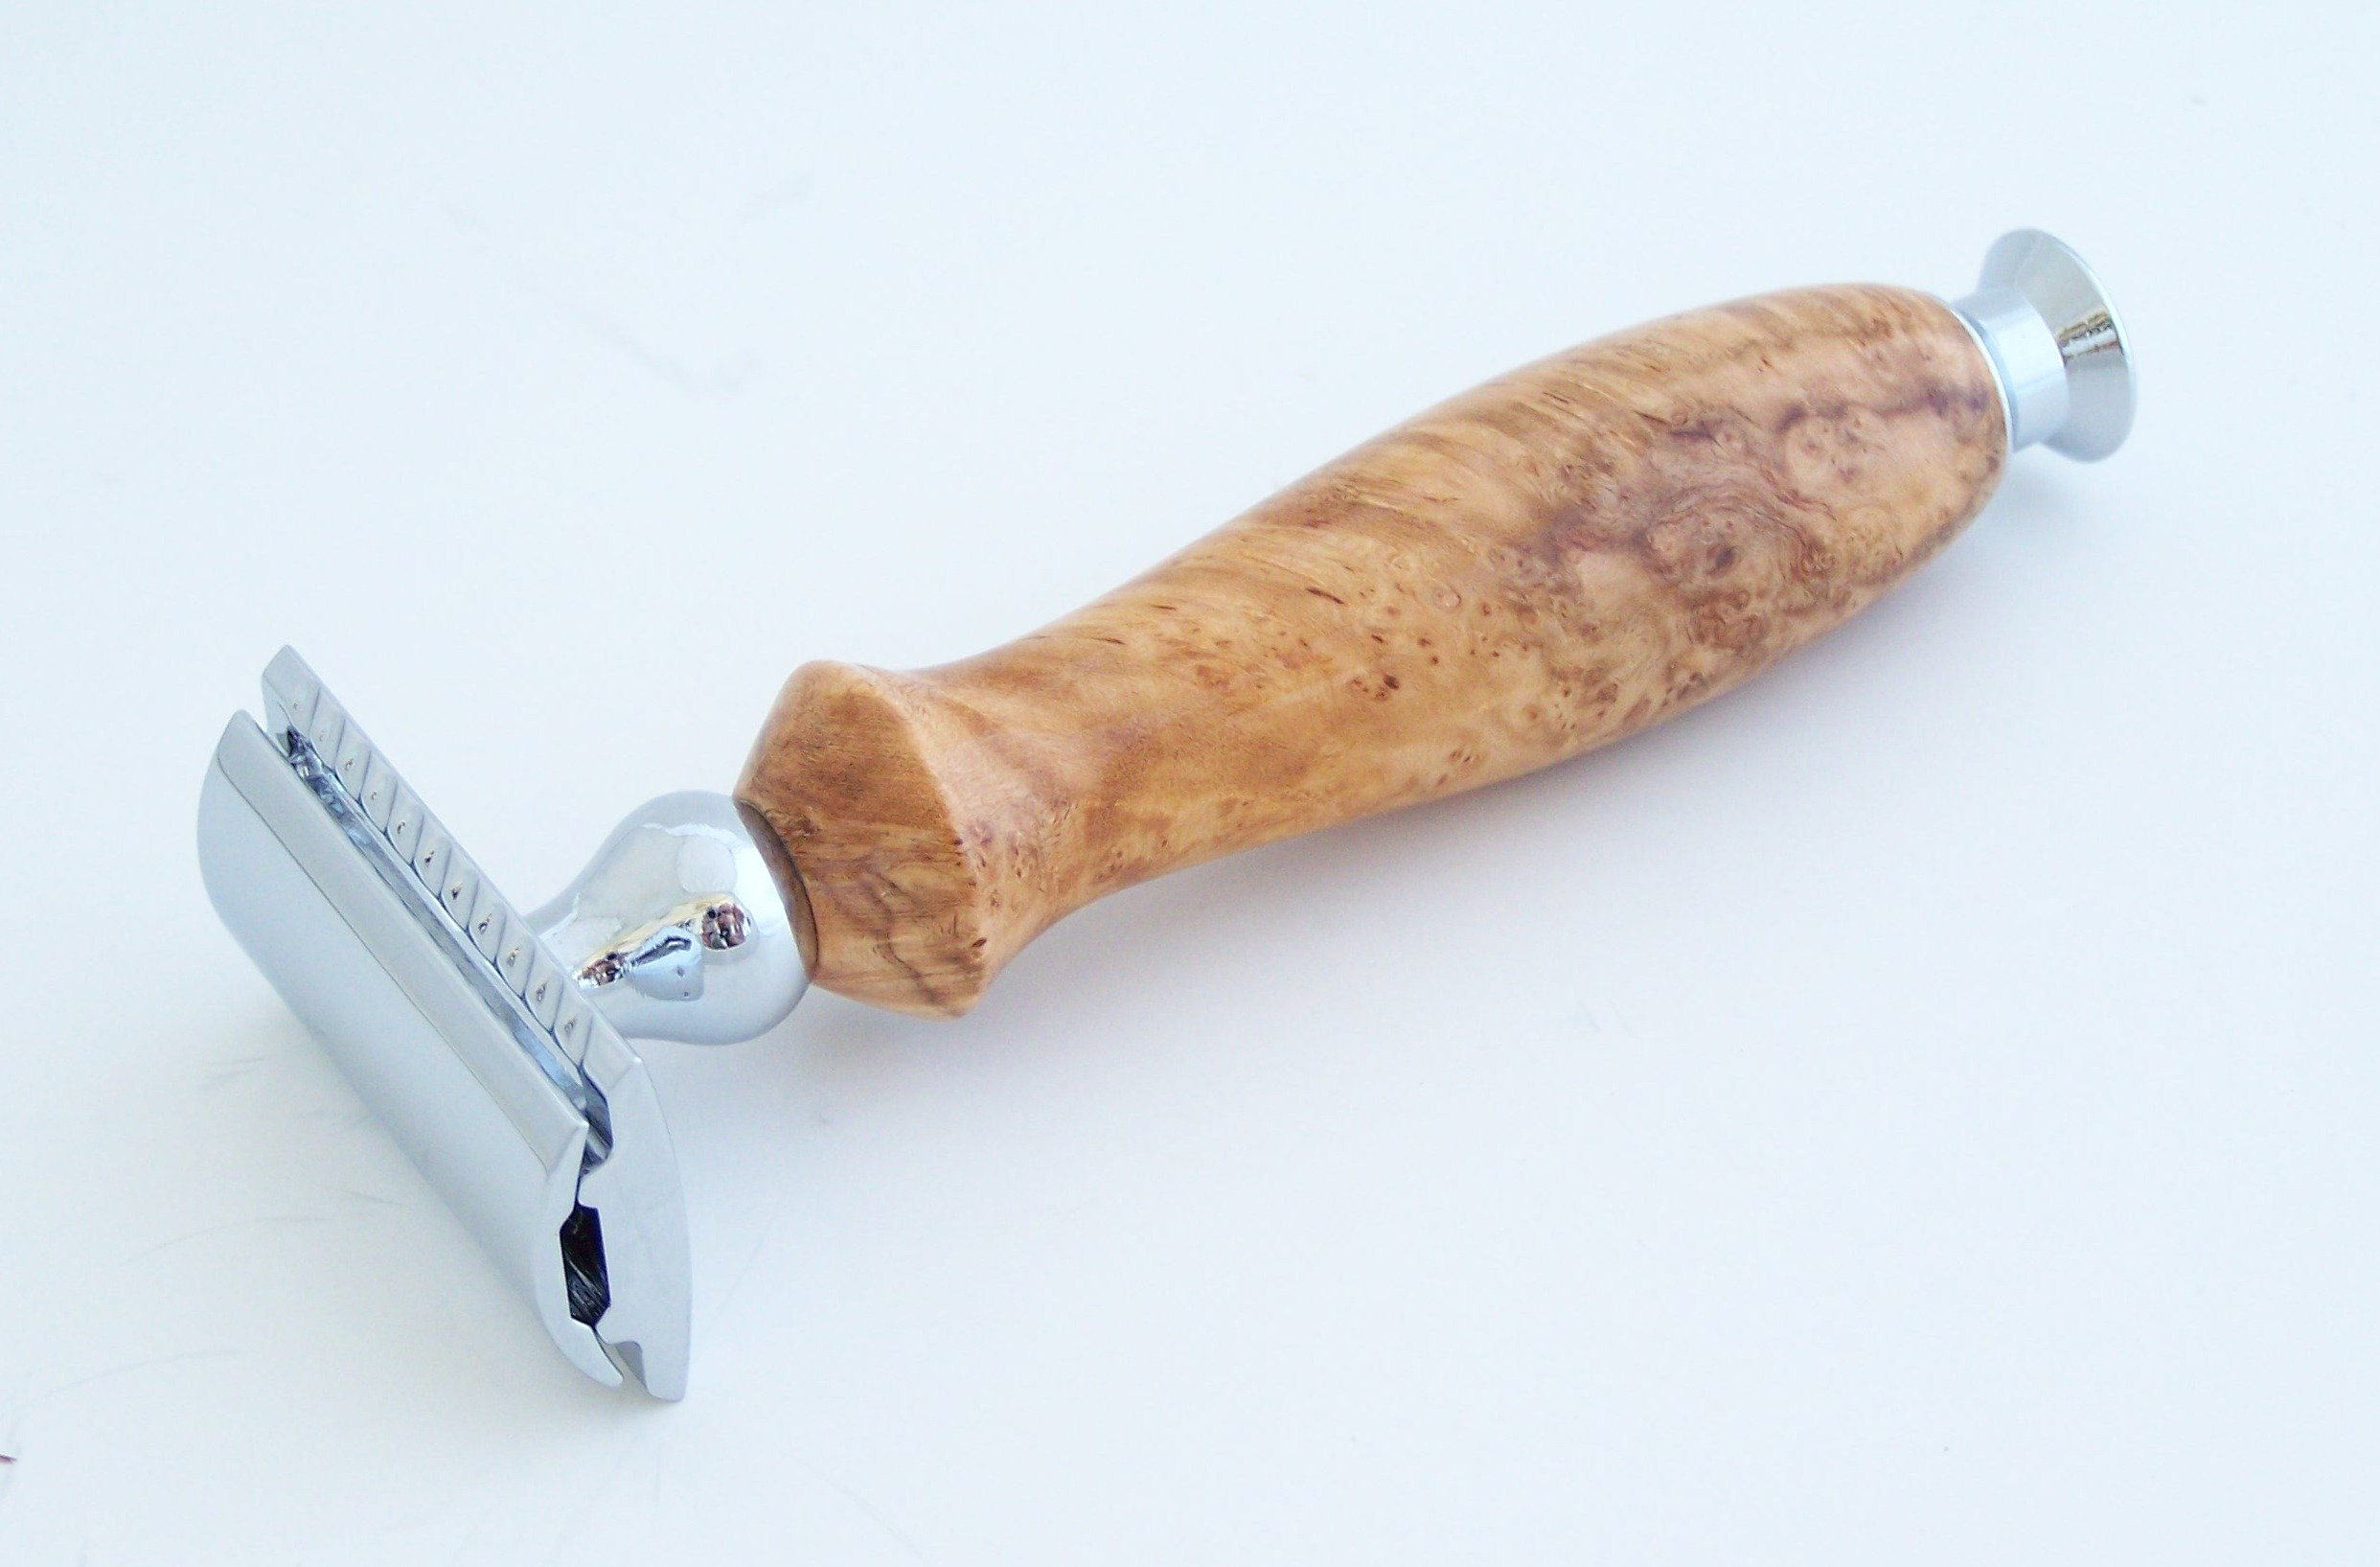 Cherry Burl Wood DE (Double Edge) Safety Razor Shaving Handle (C2)